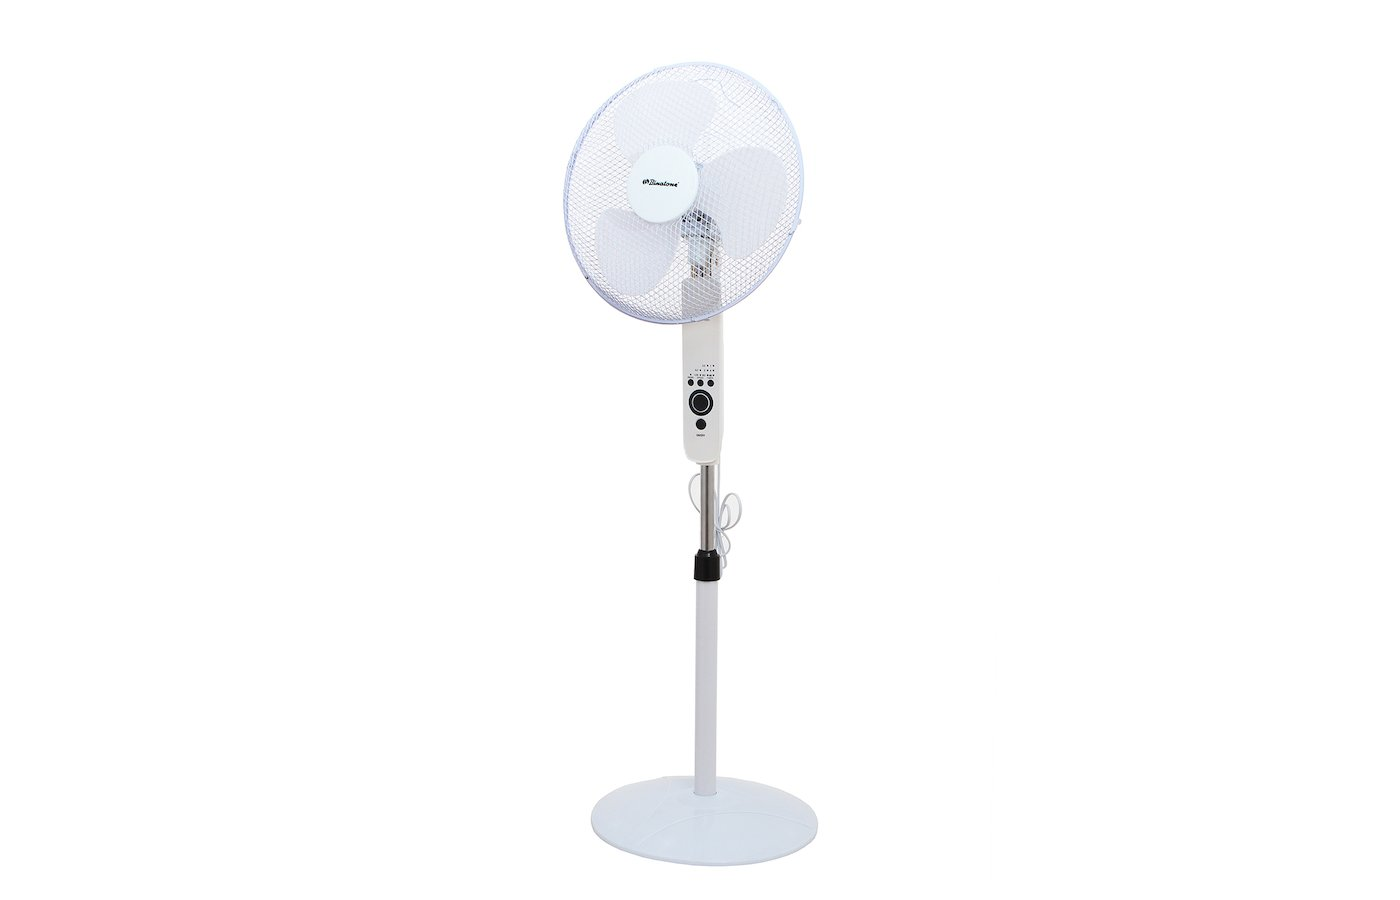 Вентилятор напольный Binatone SF 1650R